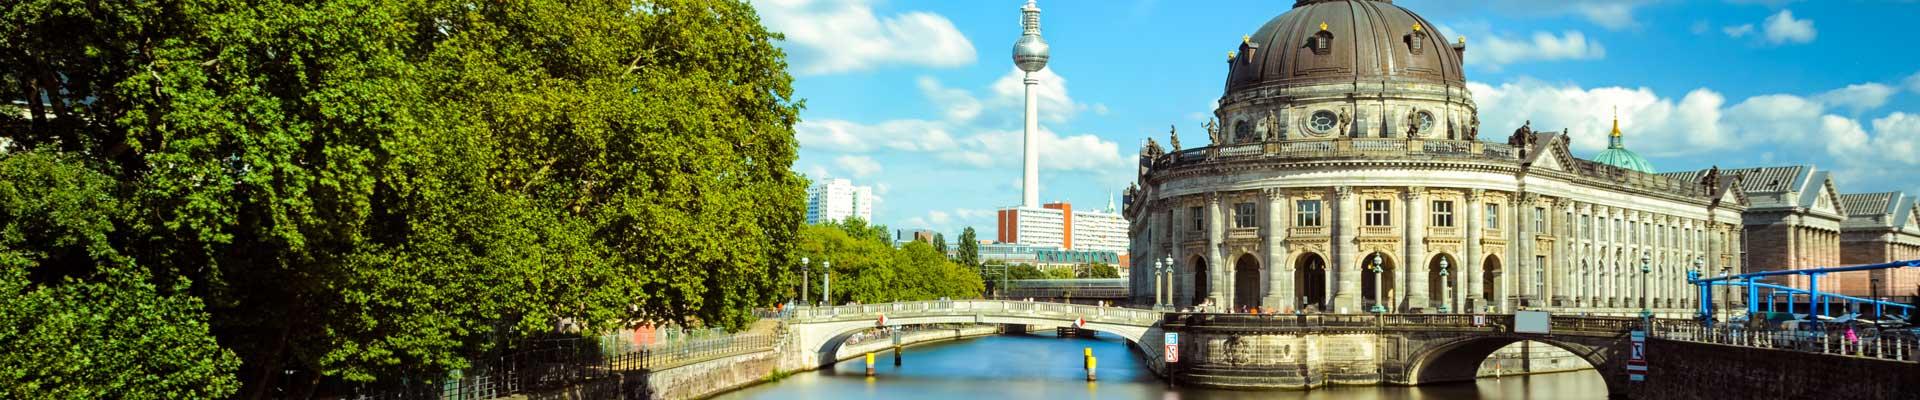 GLS Berlín